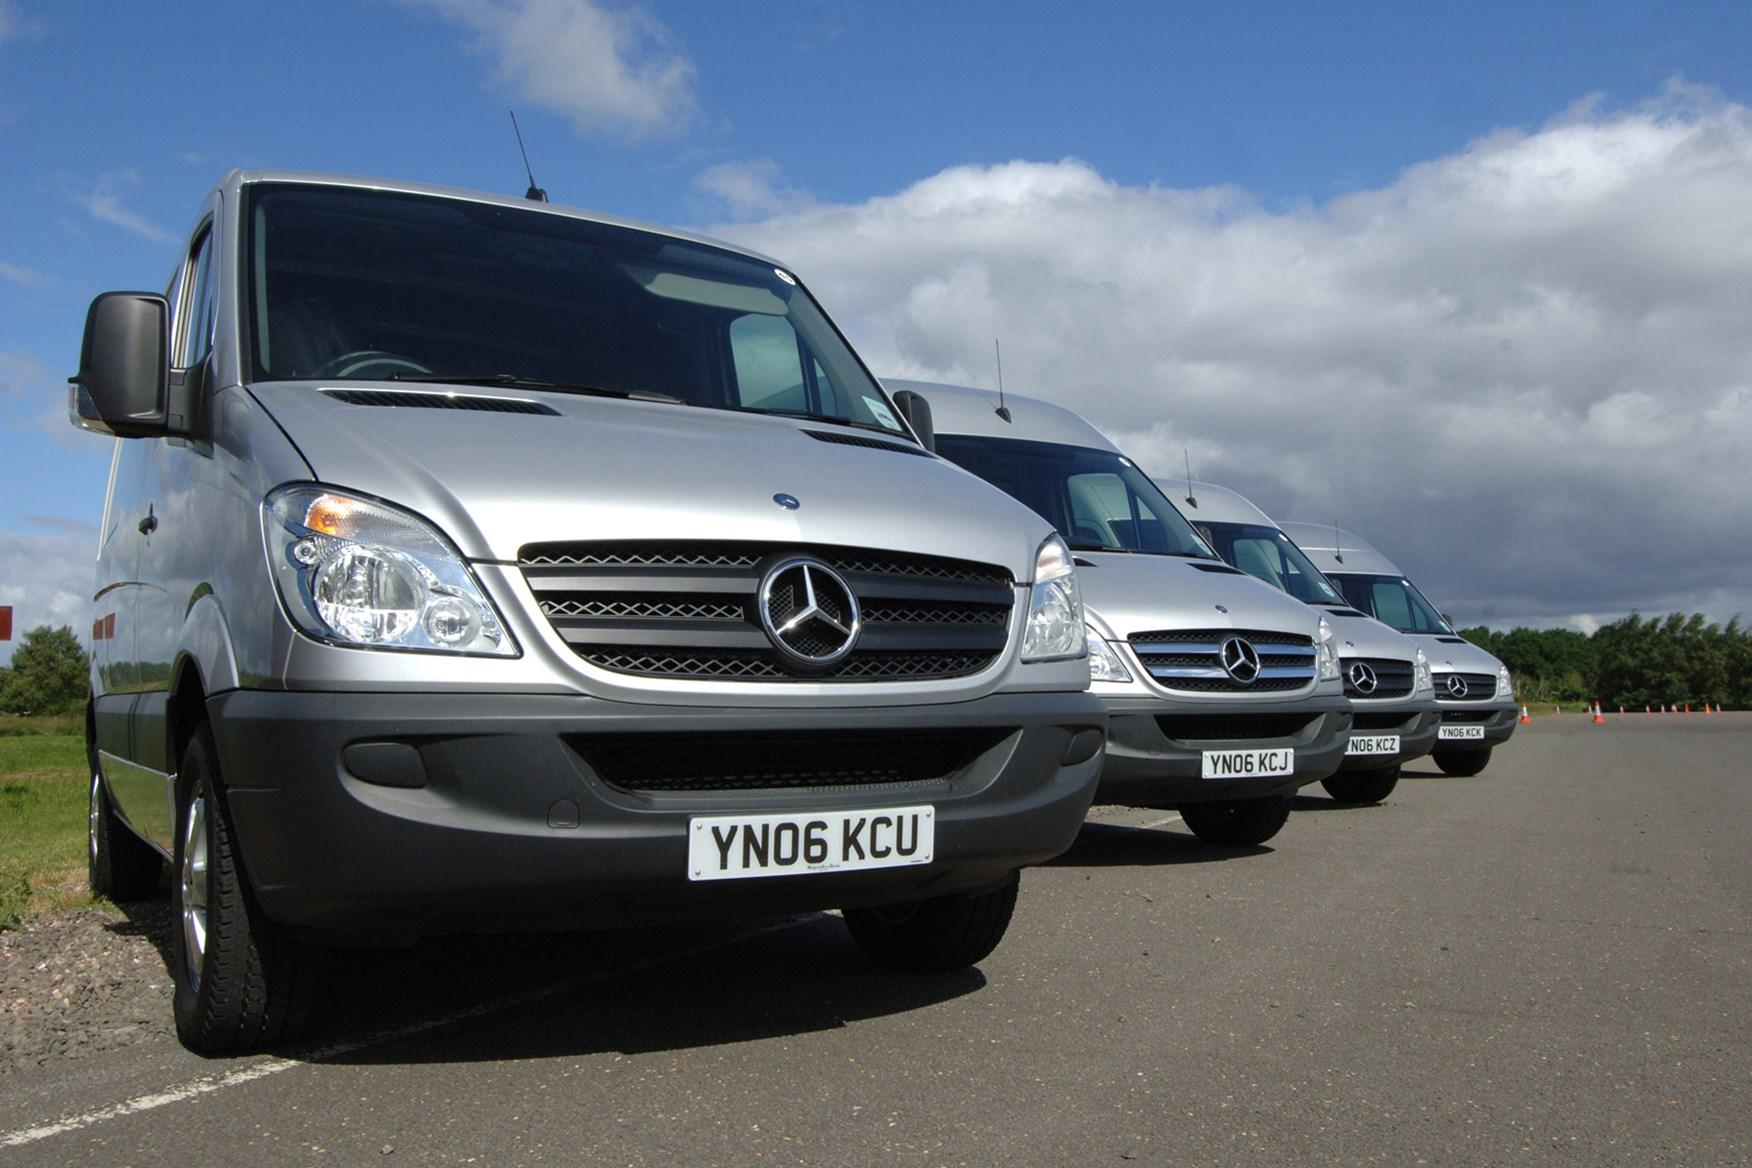 Mercedes-Benz Sprinter 2006-2013 review on Parkers Vans - front